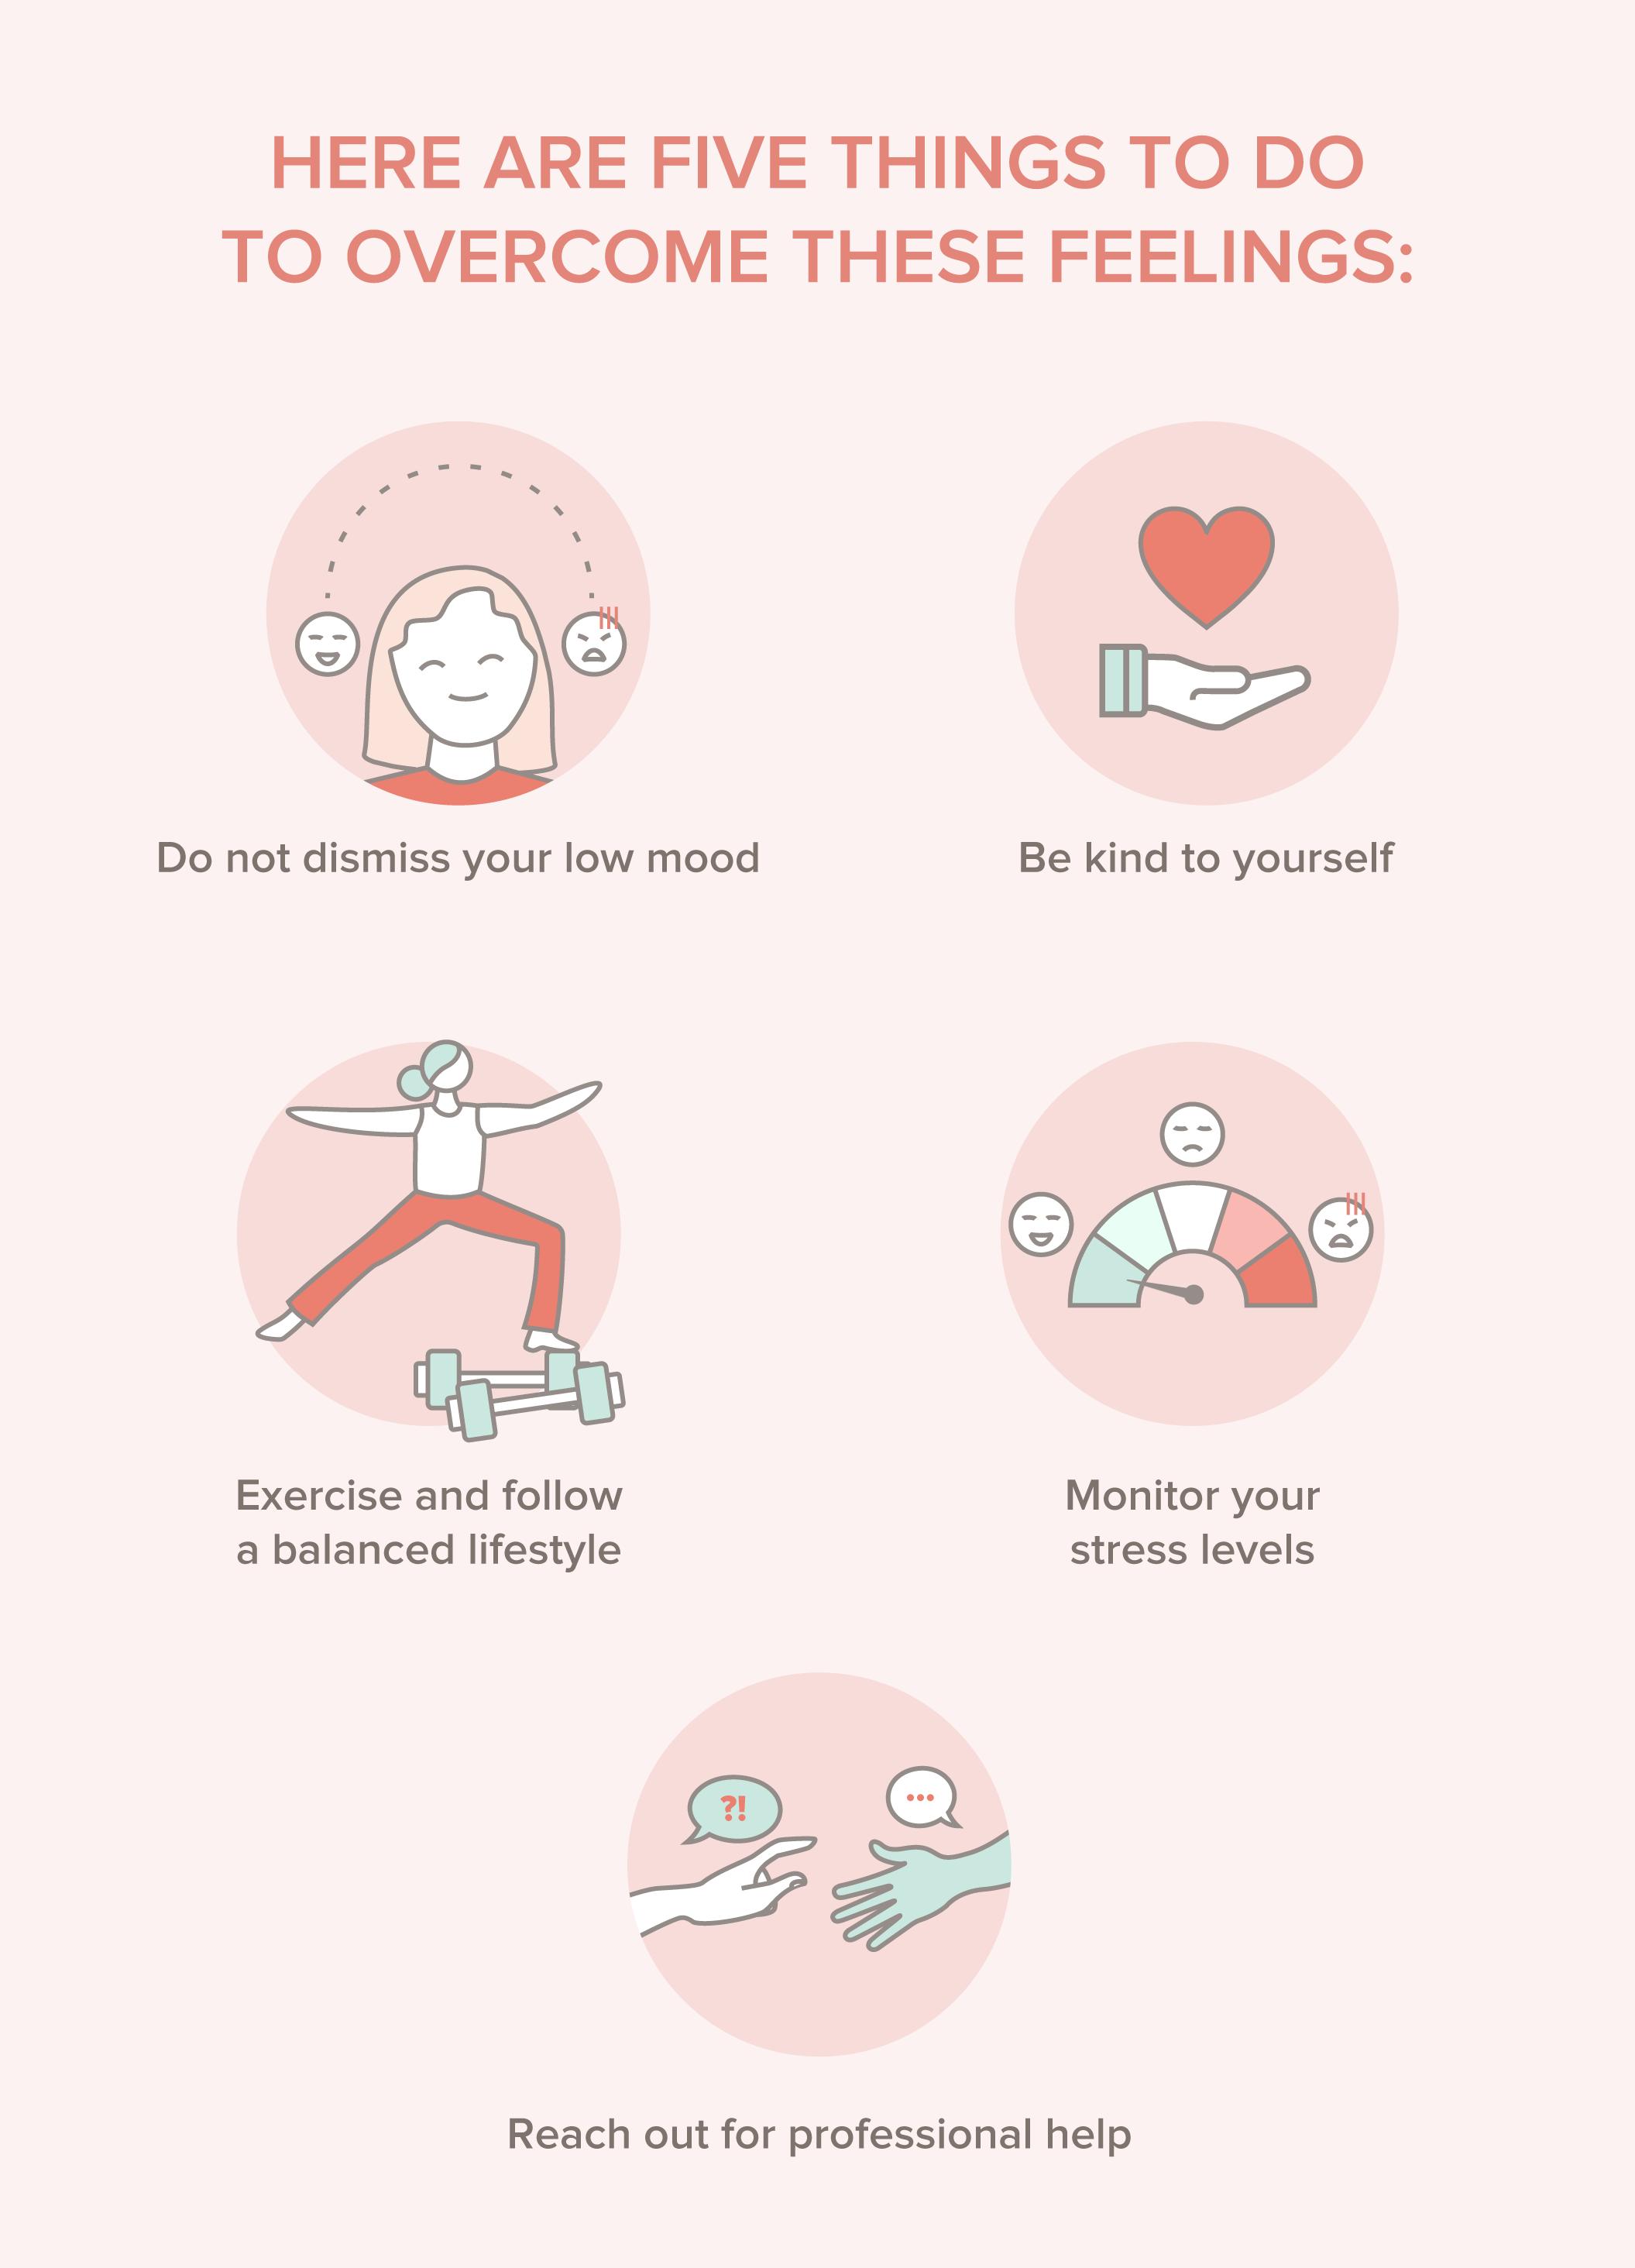 5 Things to Overcome Premenstrual Dysphoric Disorder (PMDD) Feelings